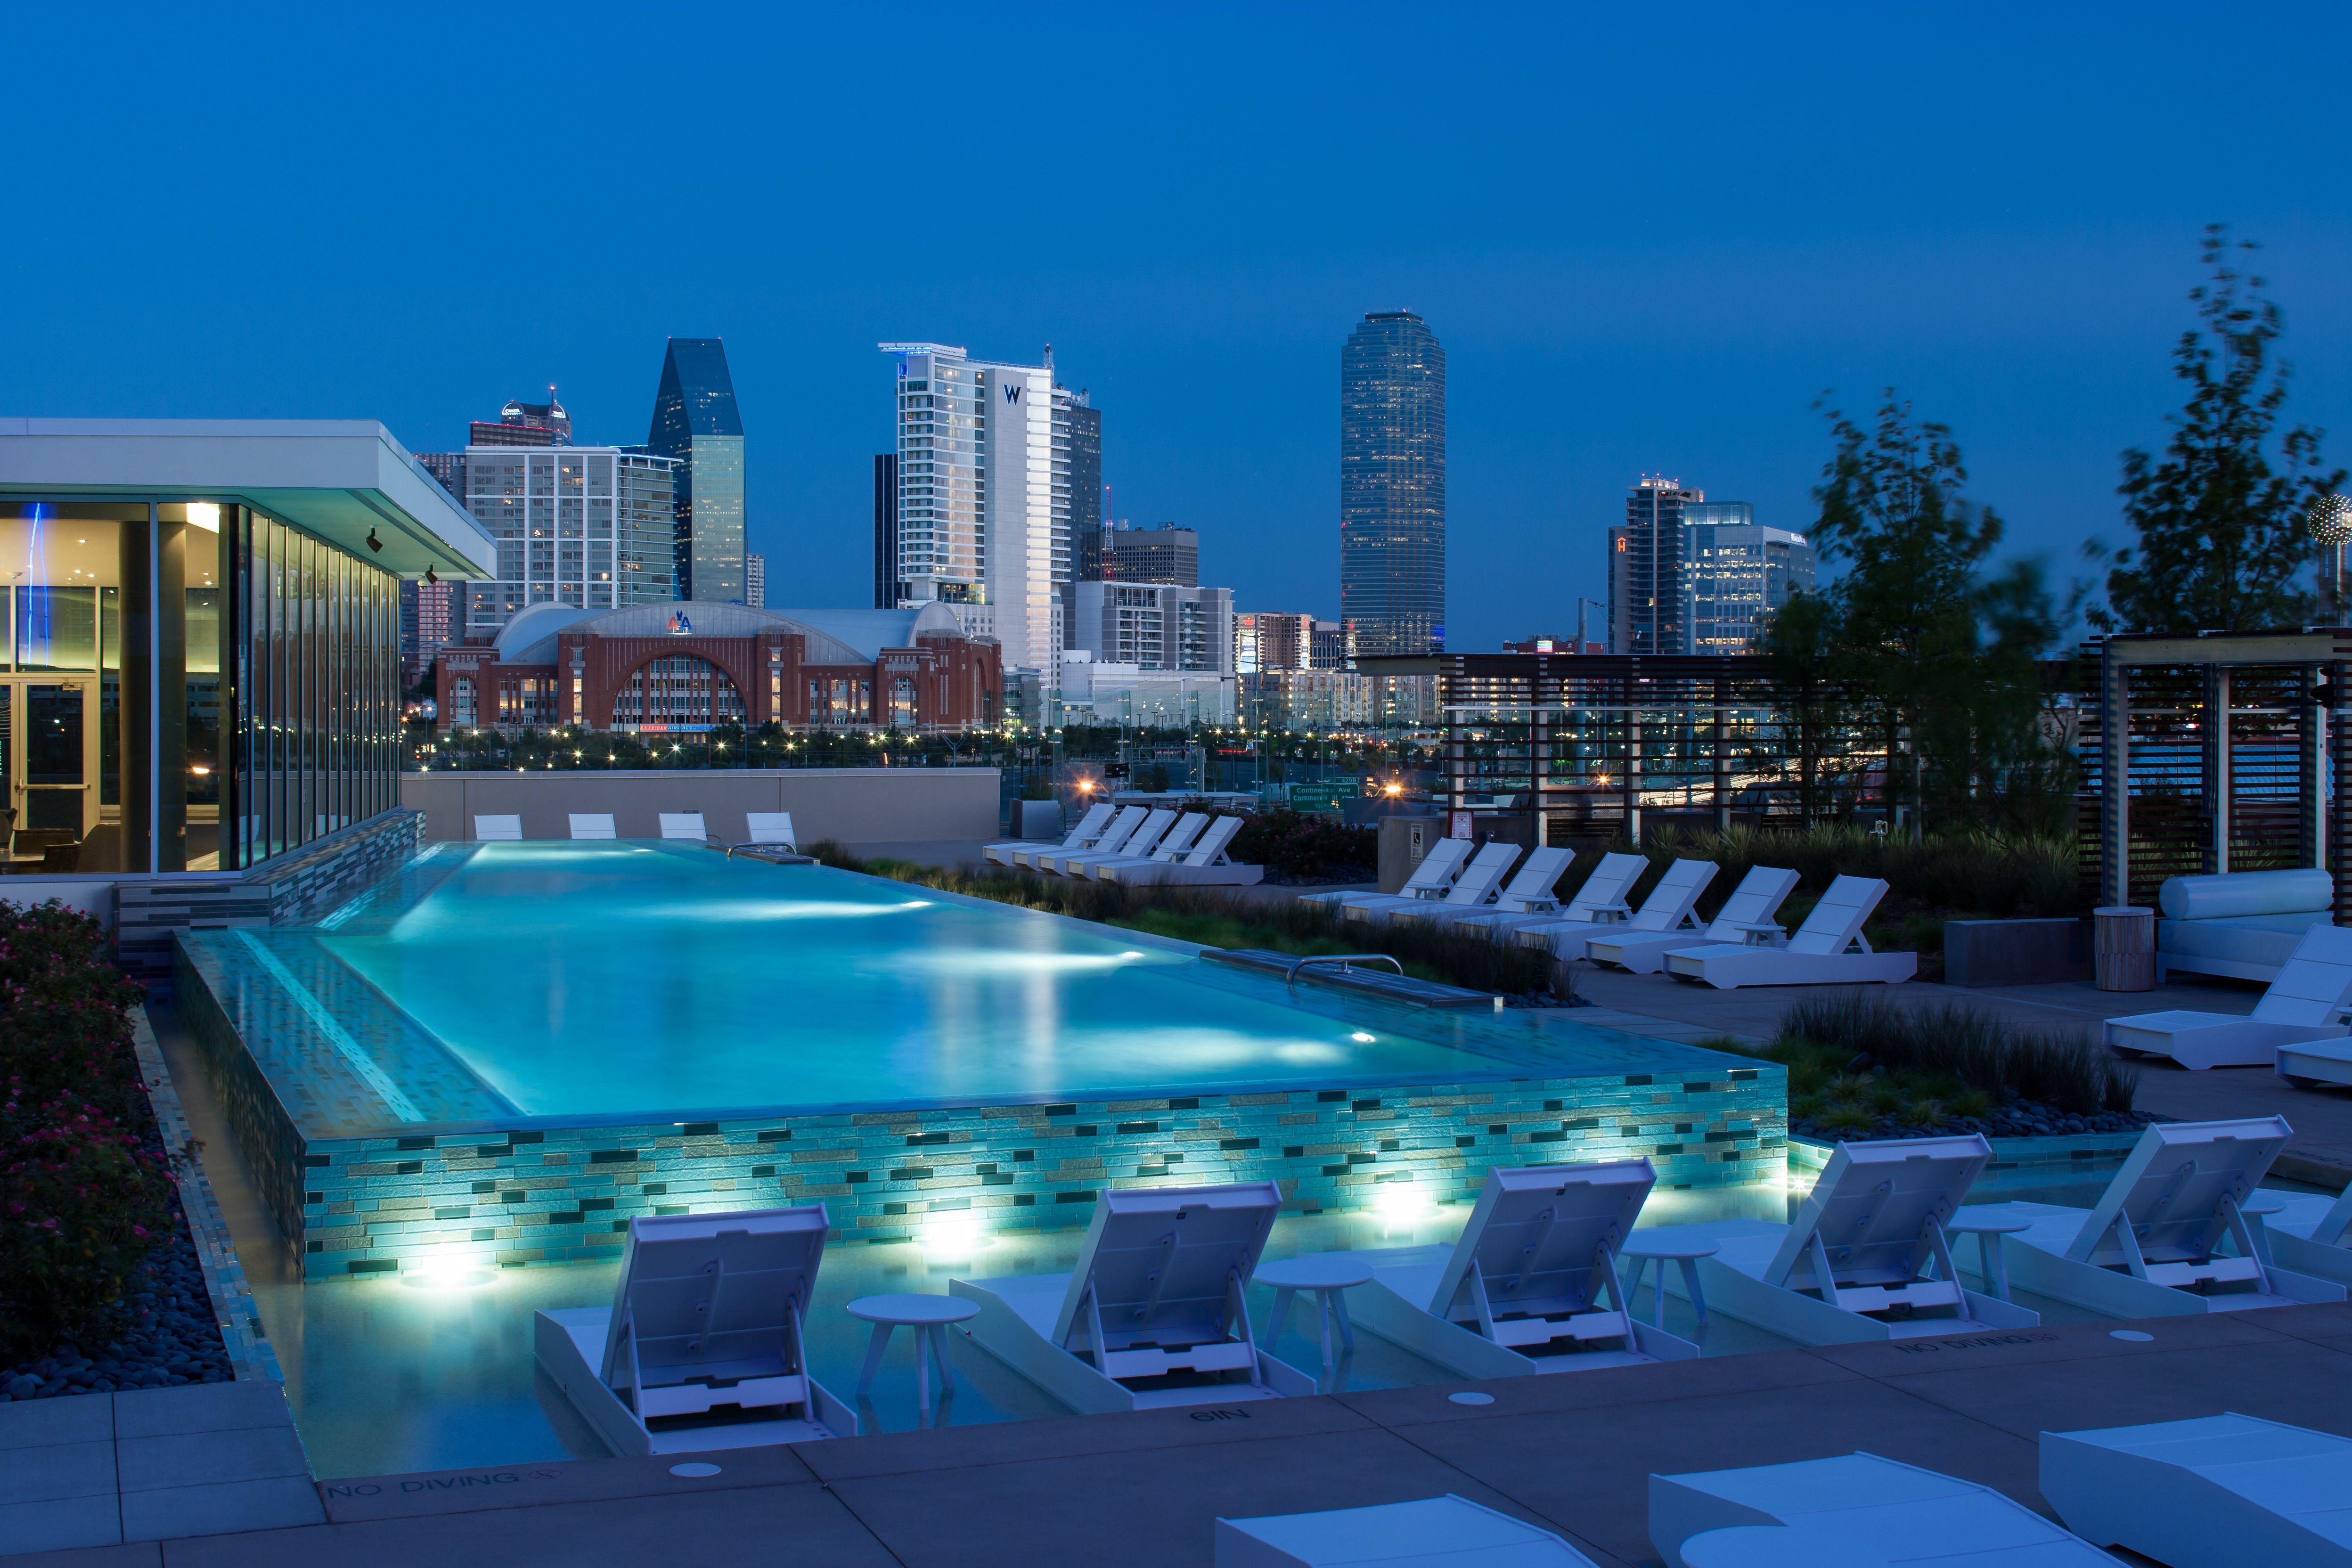 Designed By Faulkner Design Group Outdoorliving Pool Outdoorlounge Faulknerdesigngroup Interiordesign M Pool Penthouse For Sale Apartment Pool